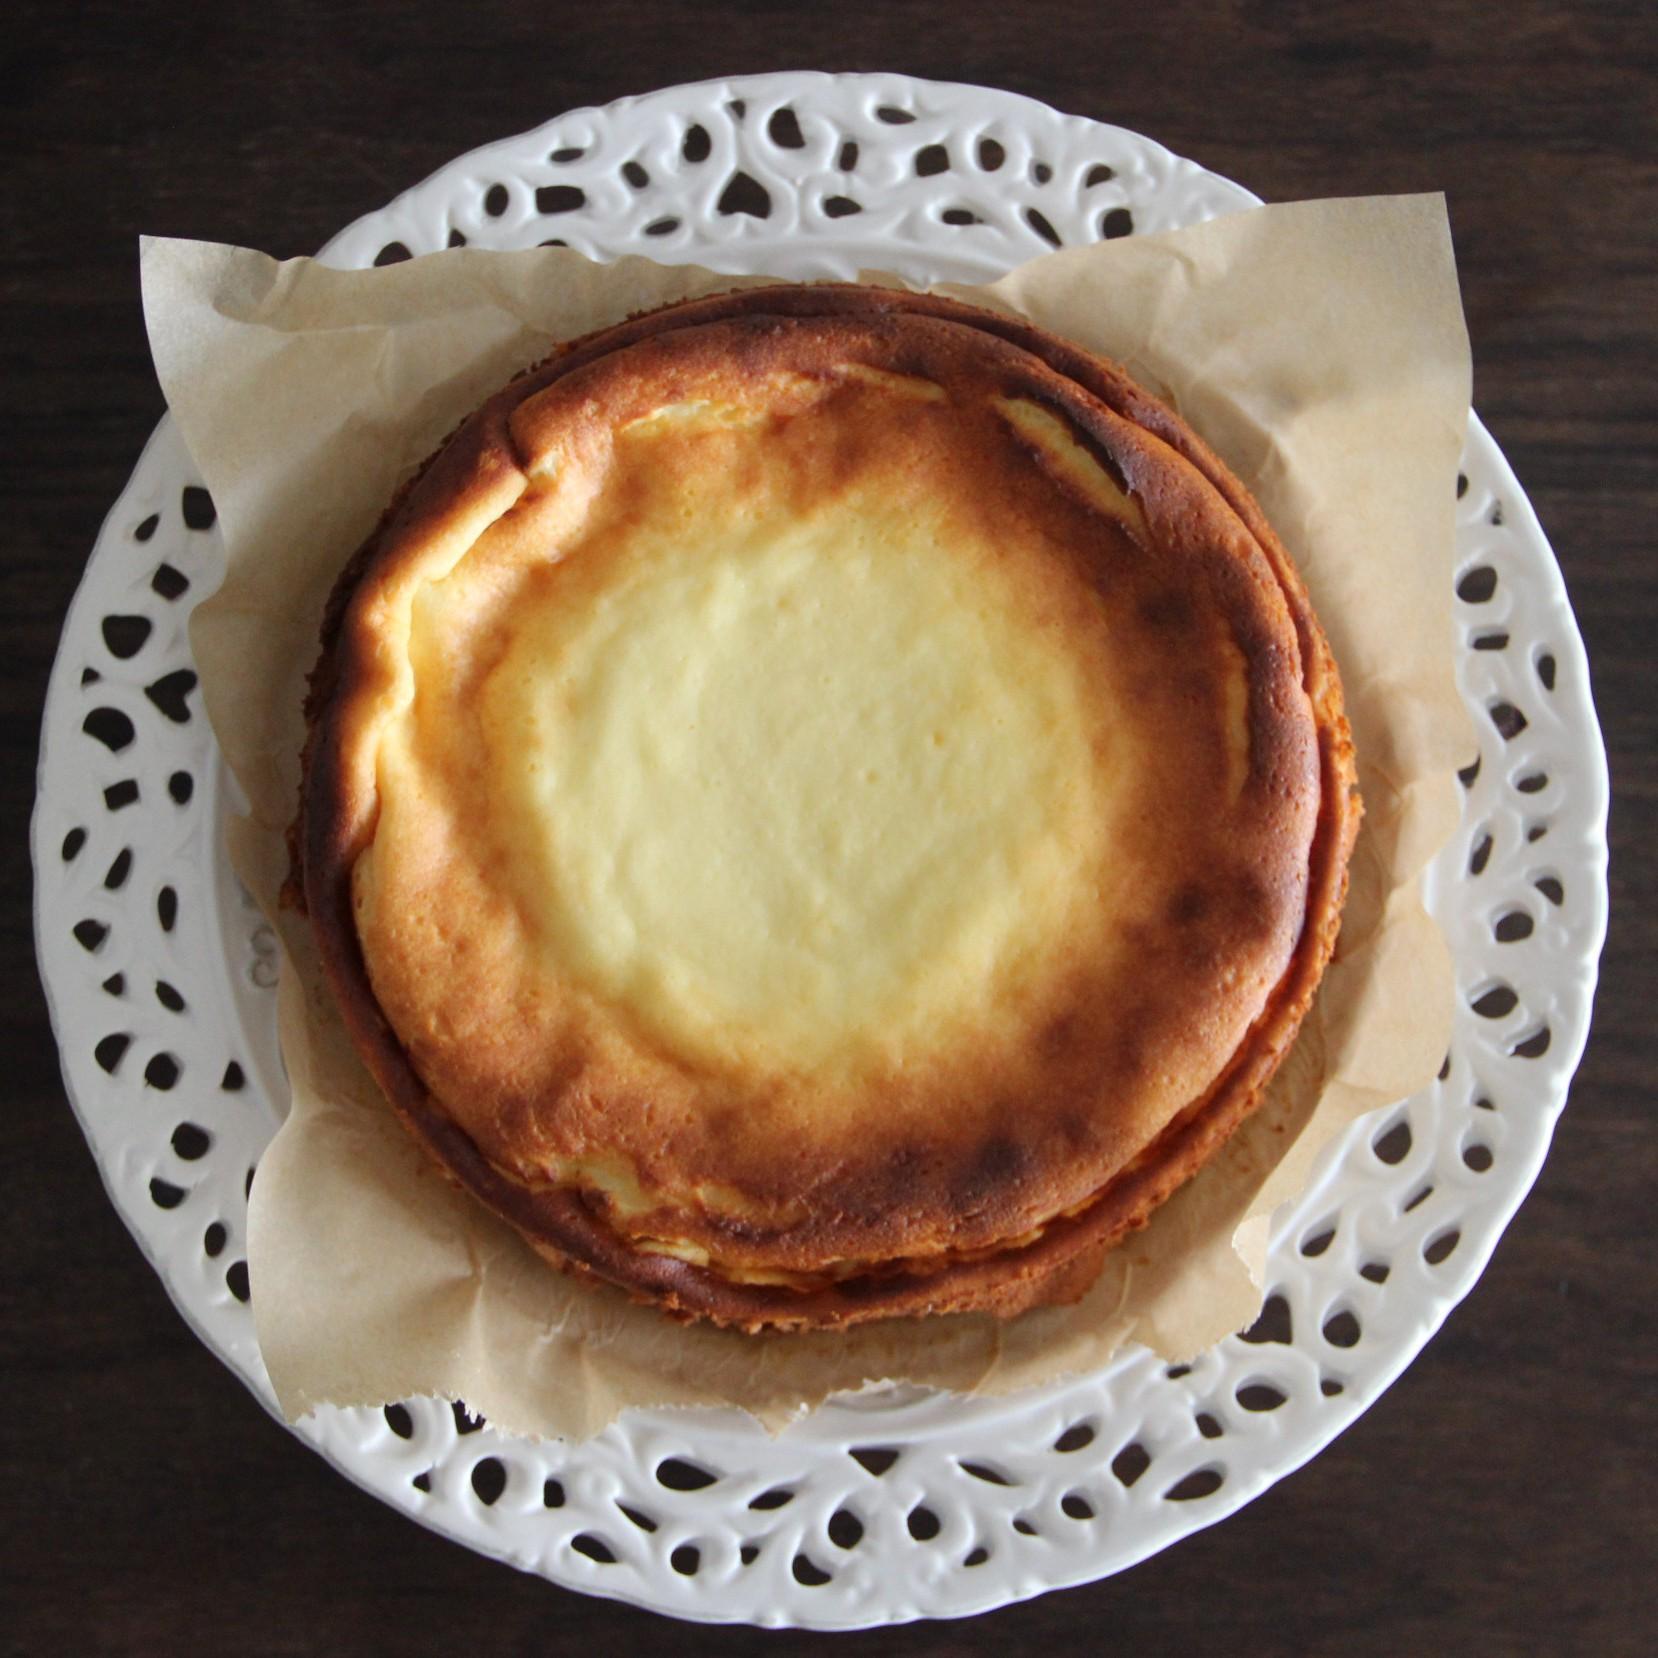 Käsekuchen ohne Boden Rezept einfach lecker easypeasy Cheesecake #käsekuchen #einfach #kuchen #backen | Emma´s Lieblingsstücke